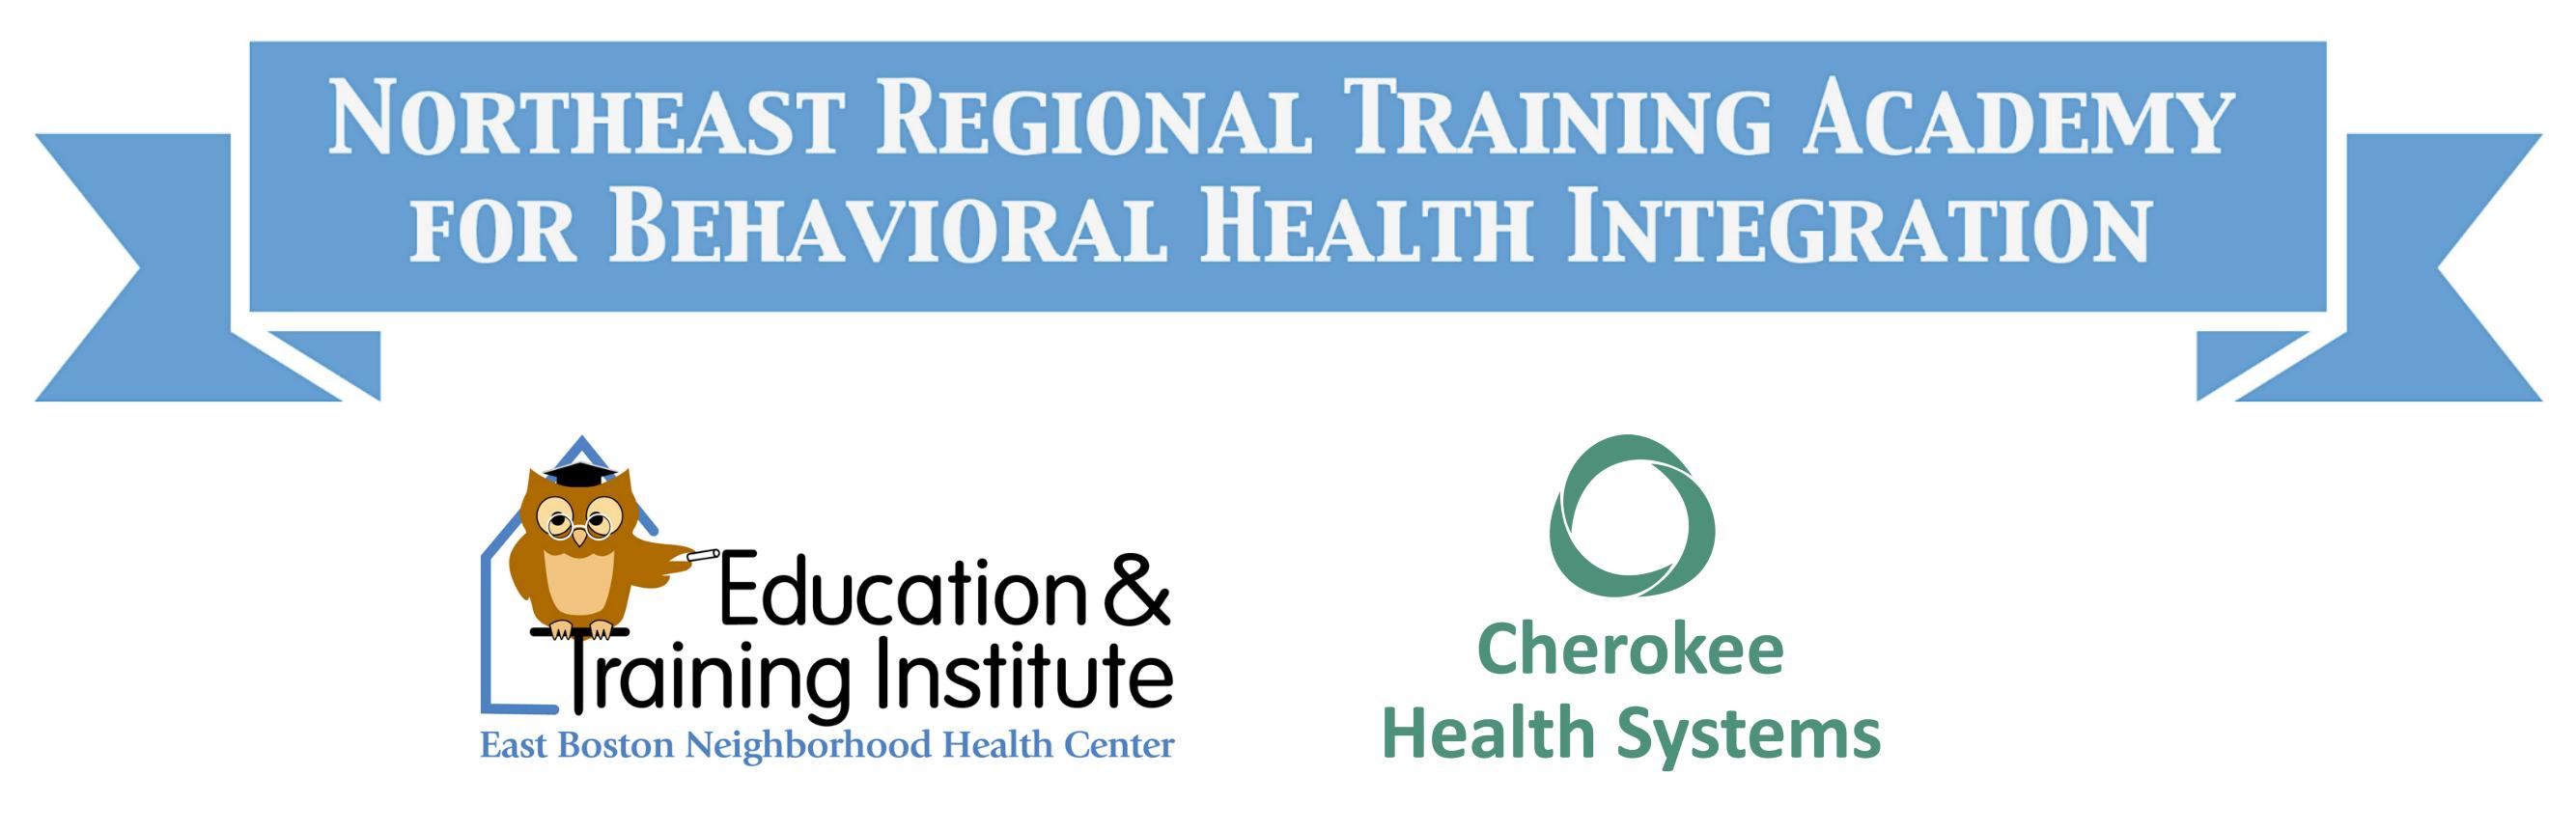 Northeast Regional Training Academy For Behavioral Health